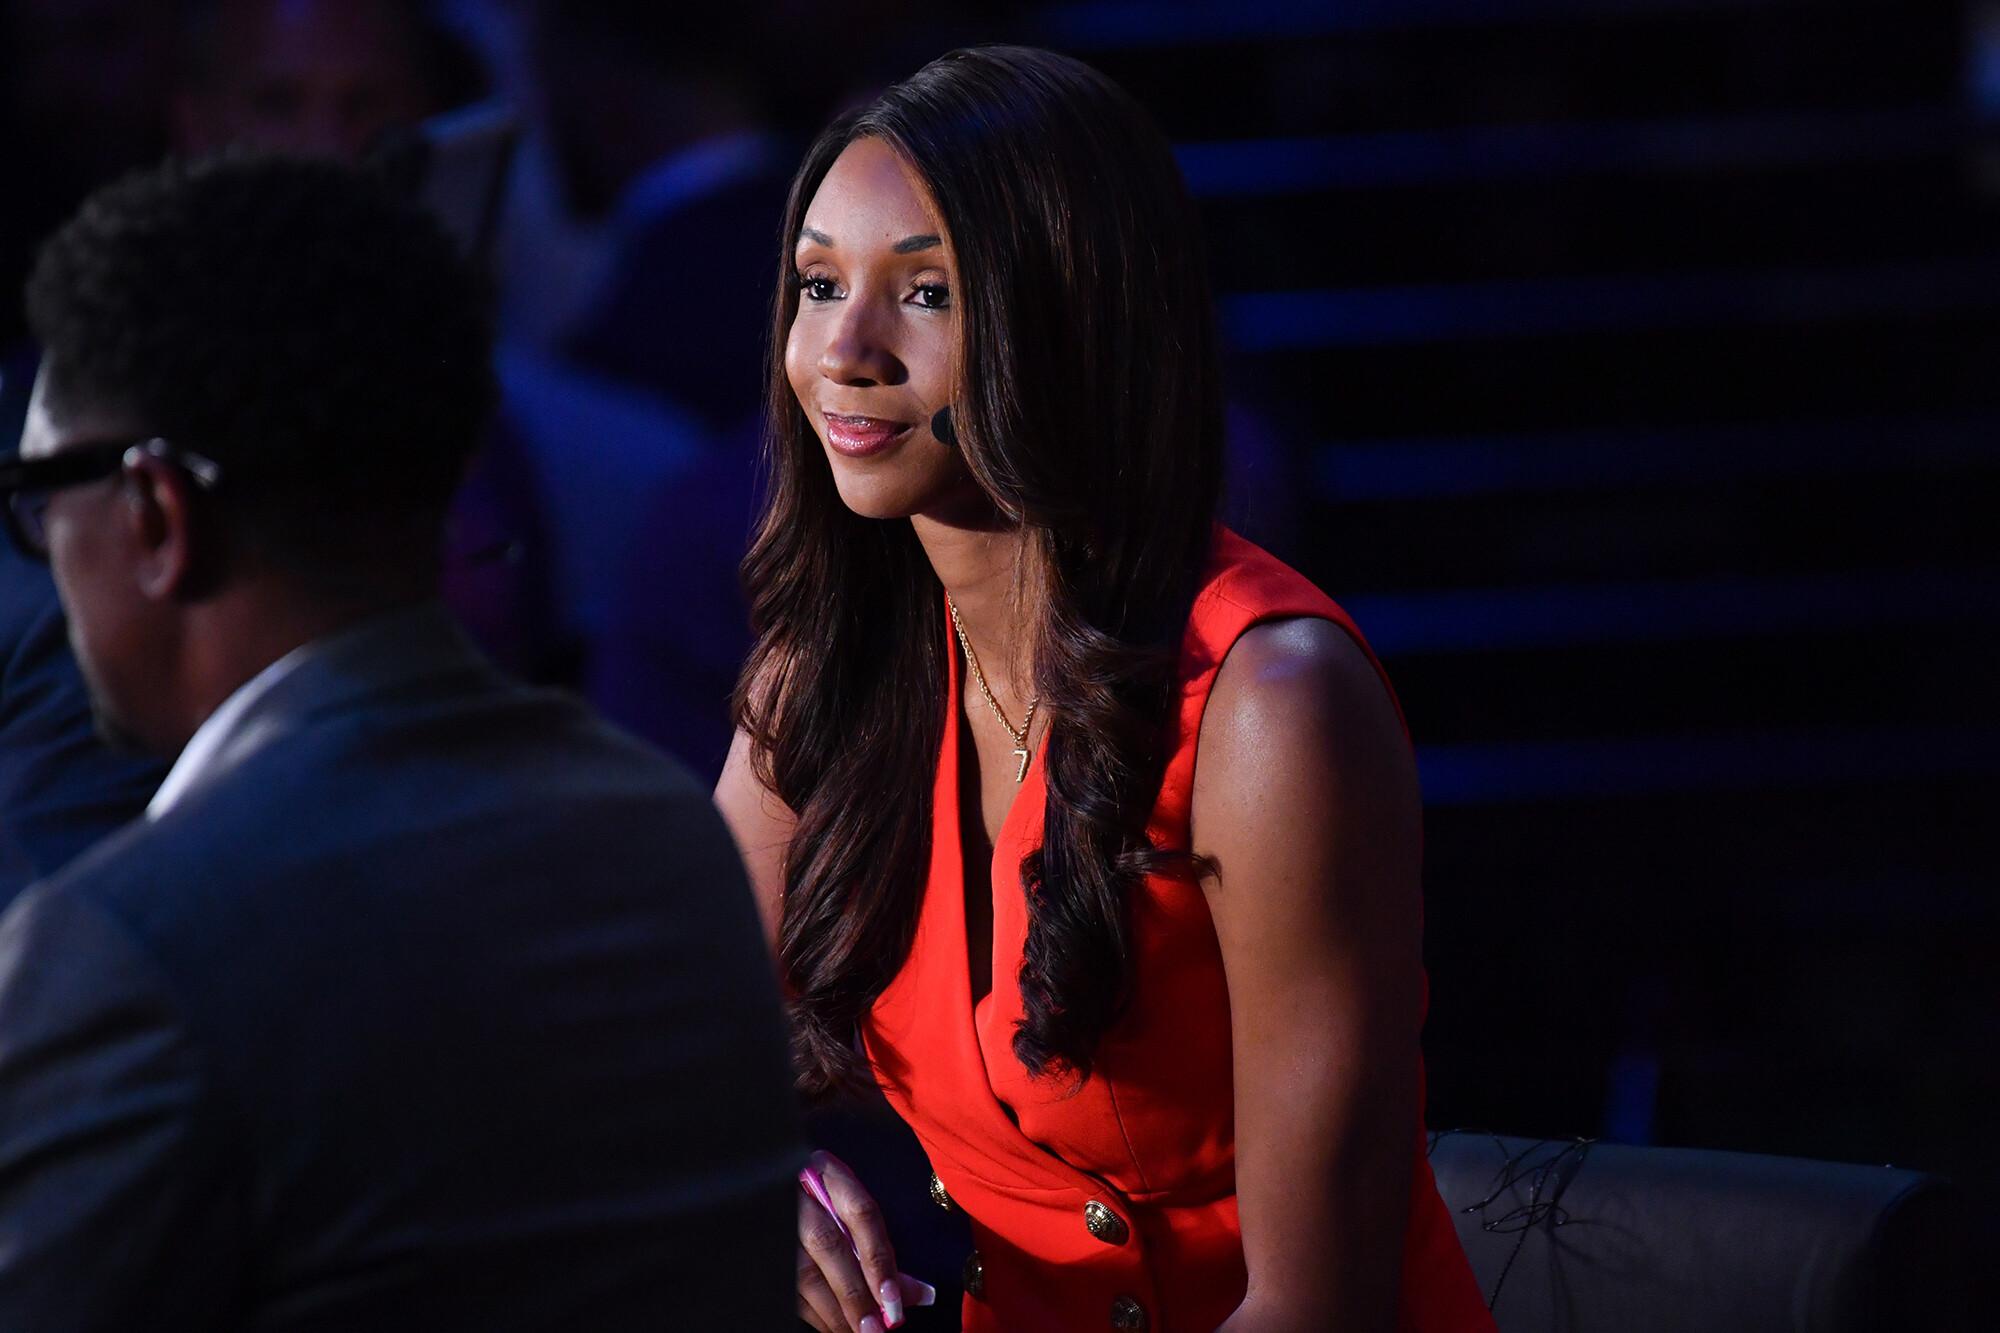 Maria Taylor leaves ESPN following Rachel Nichols comments